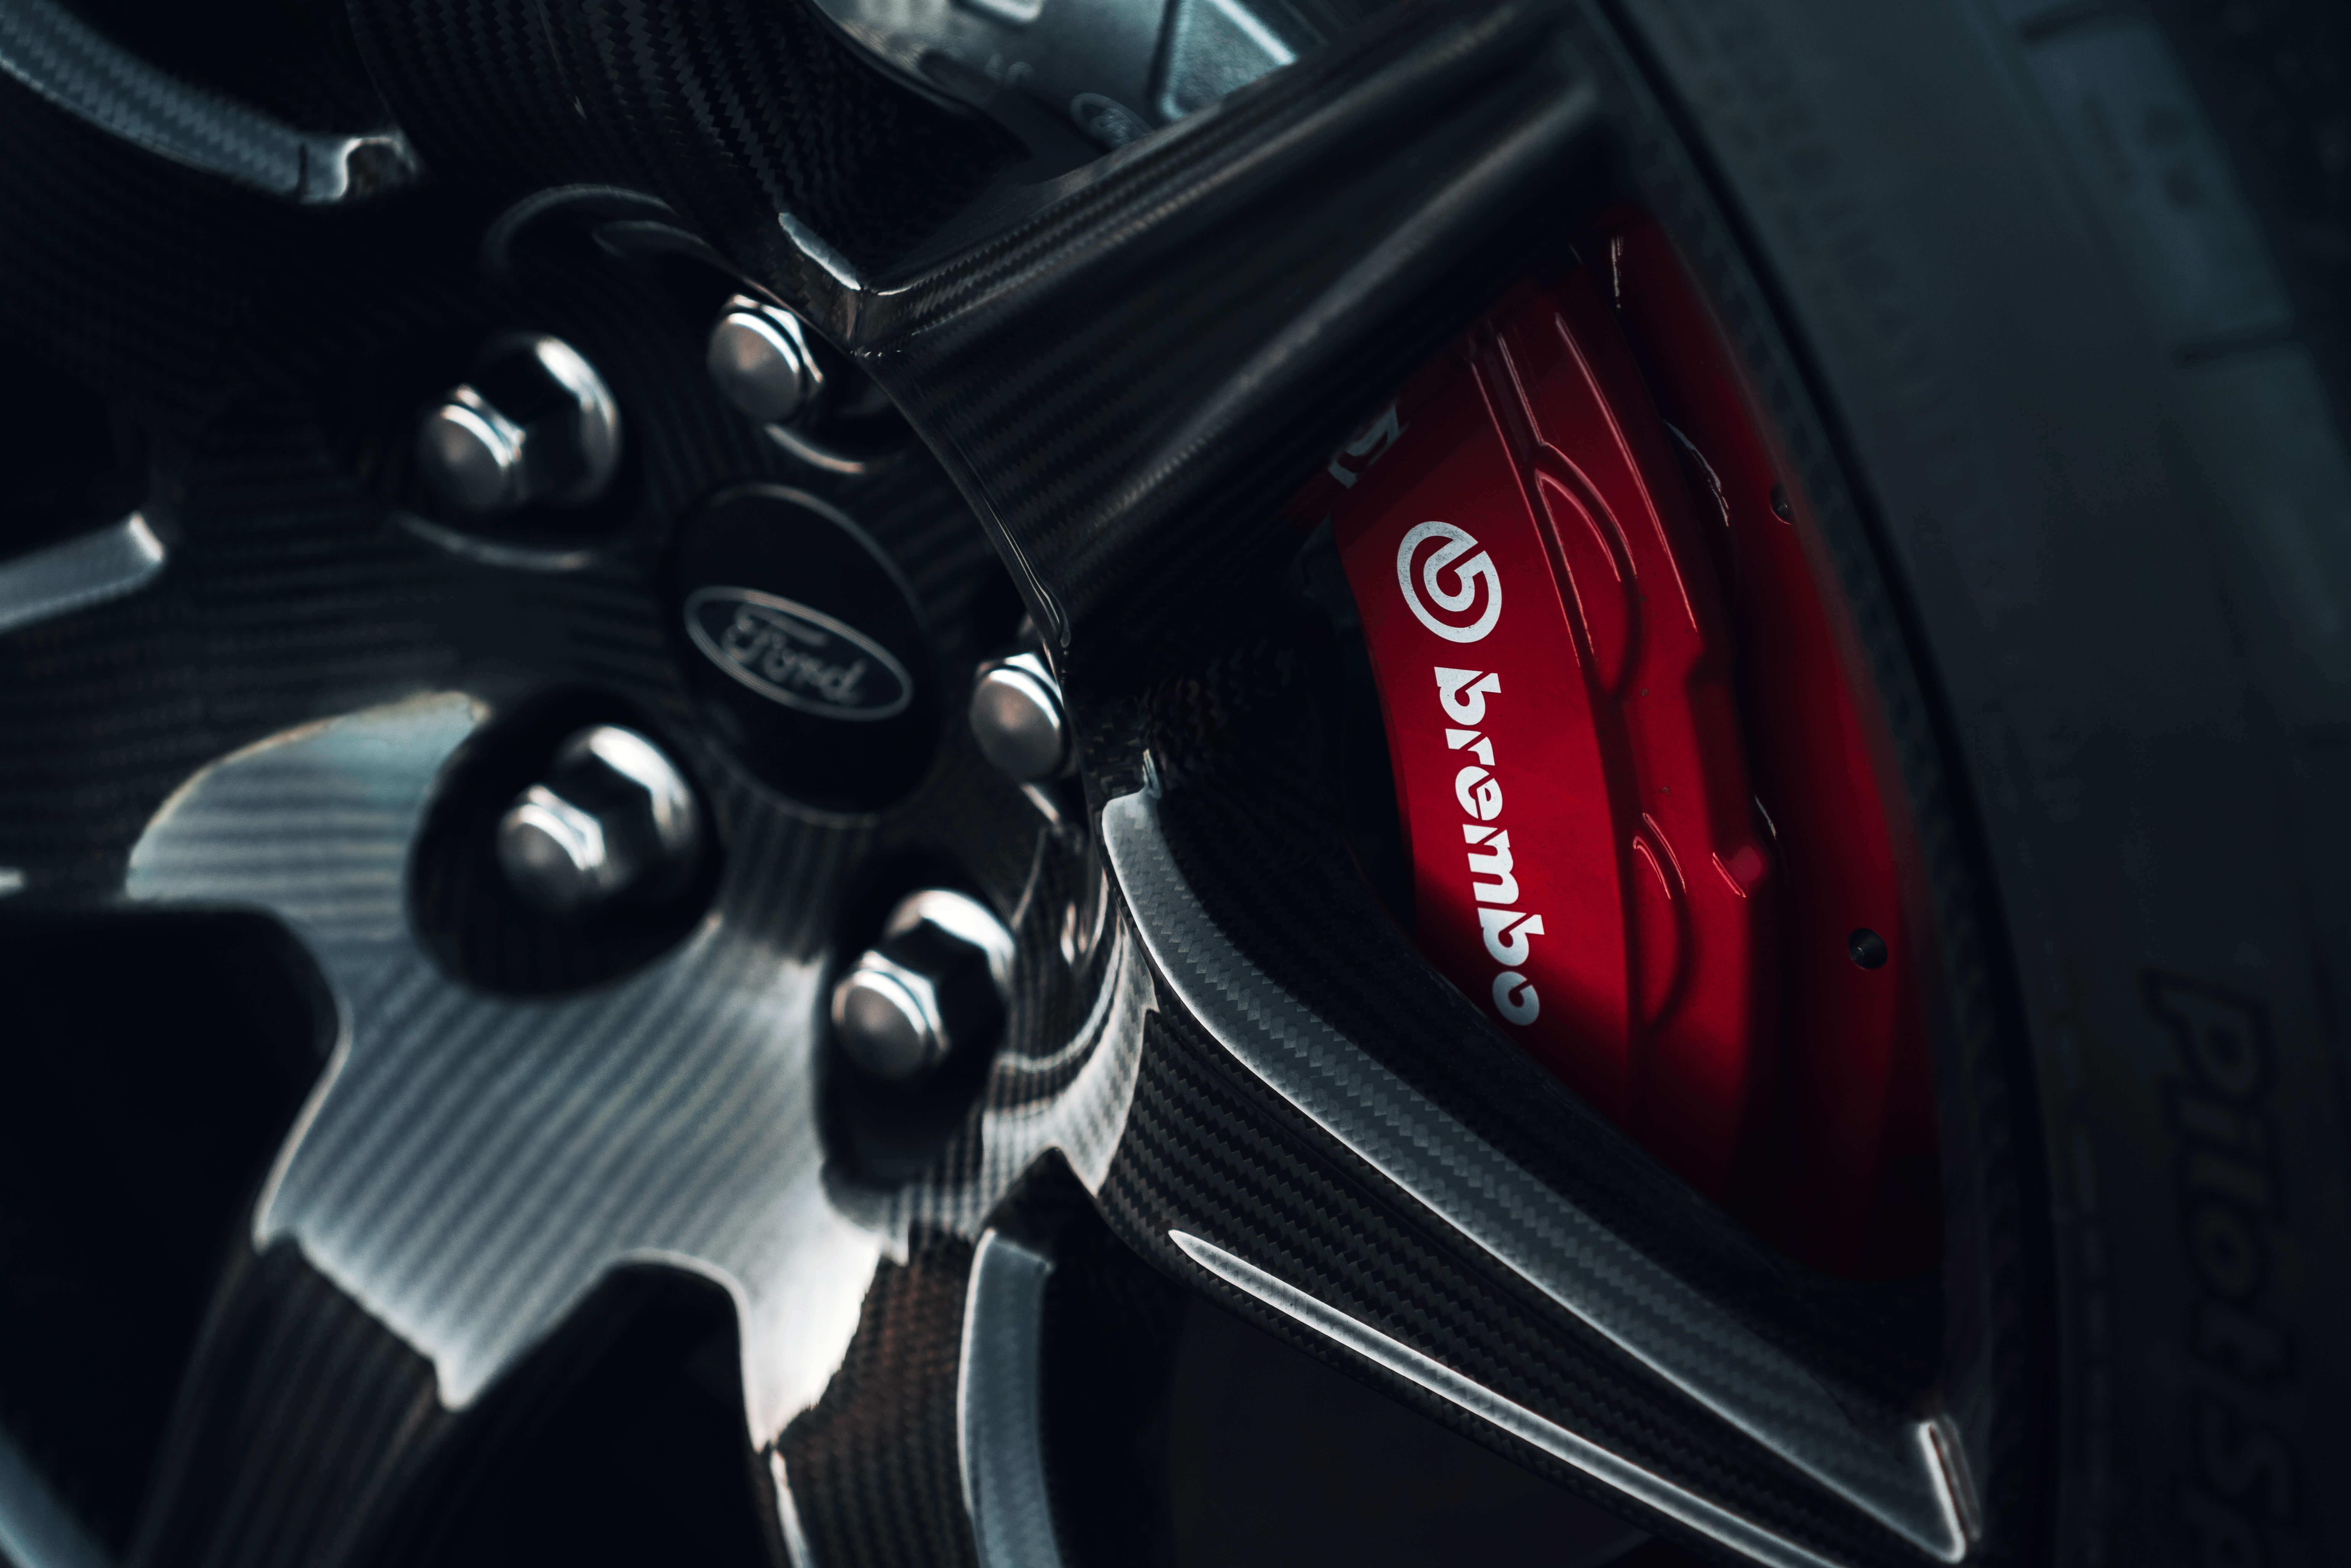 2020 shelby gt500 carbon fiber wheel